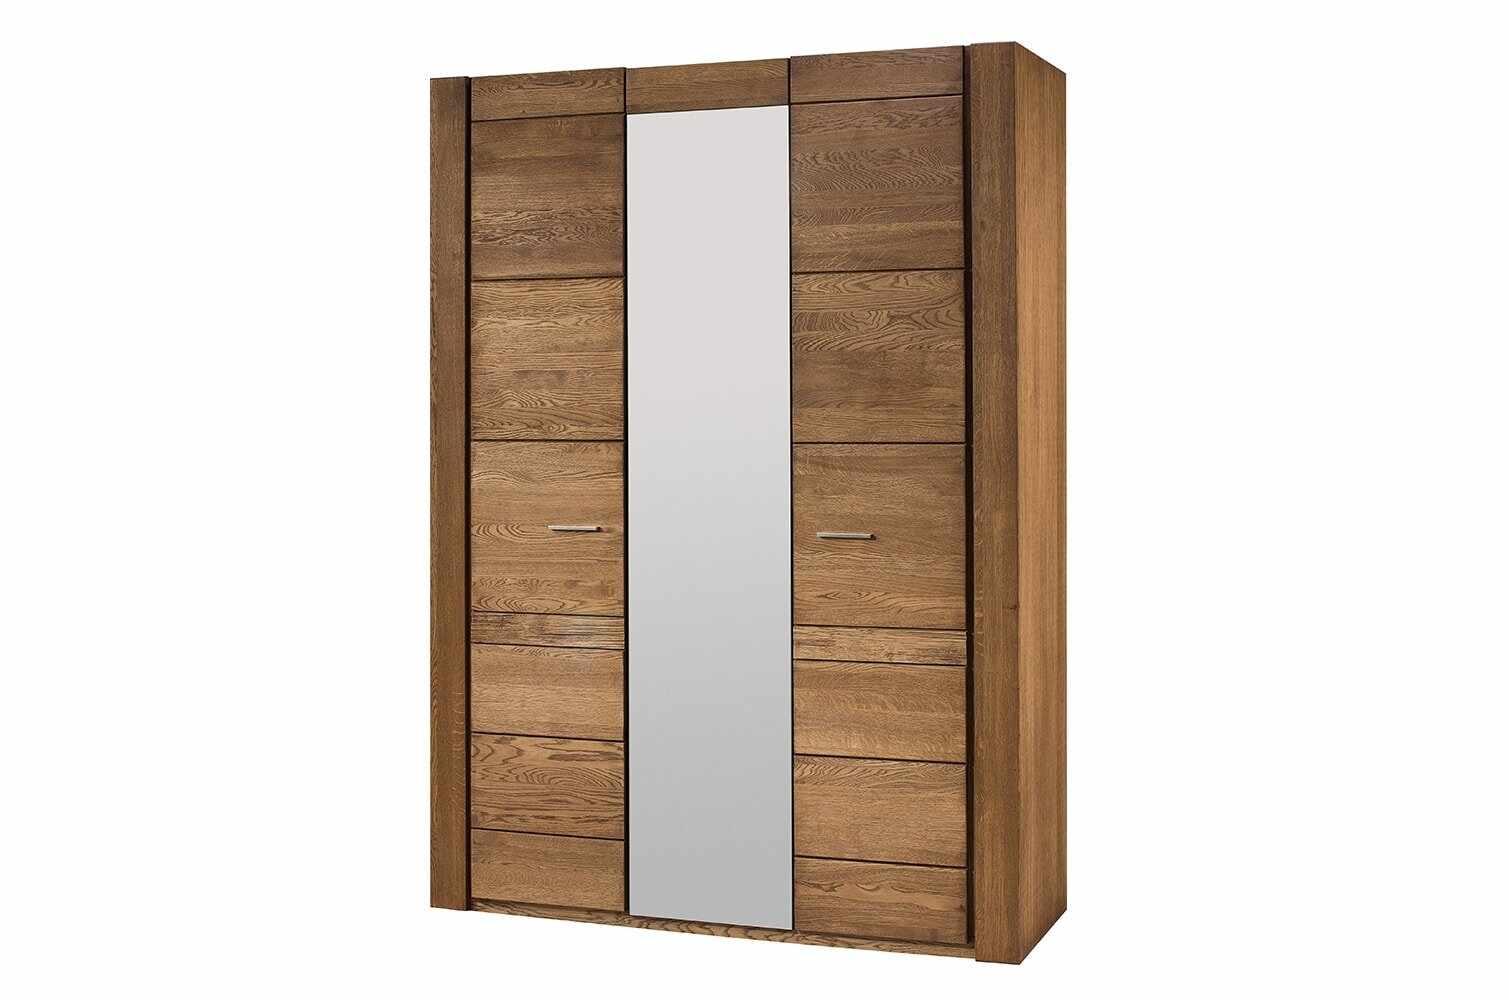 Dulap din furnir si pal, cu 3 usi si oglinda Velvet 73 Stejar Rustic, l160xA60xH225 cm la pret 5521 lei